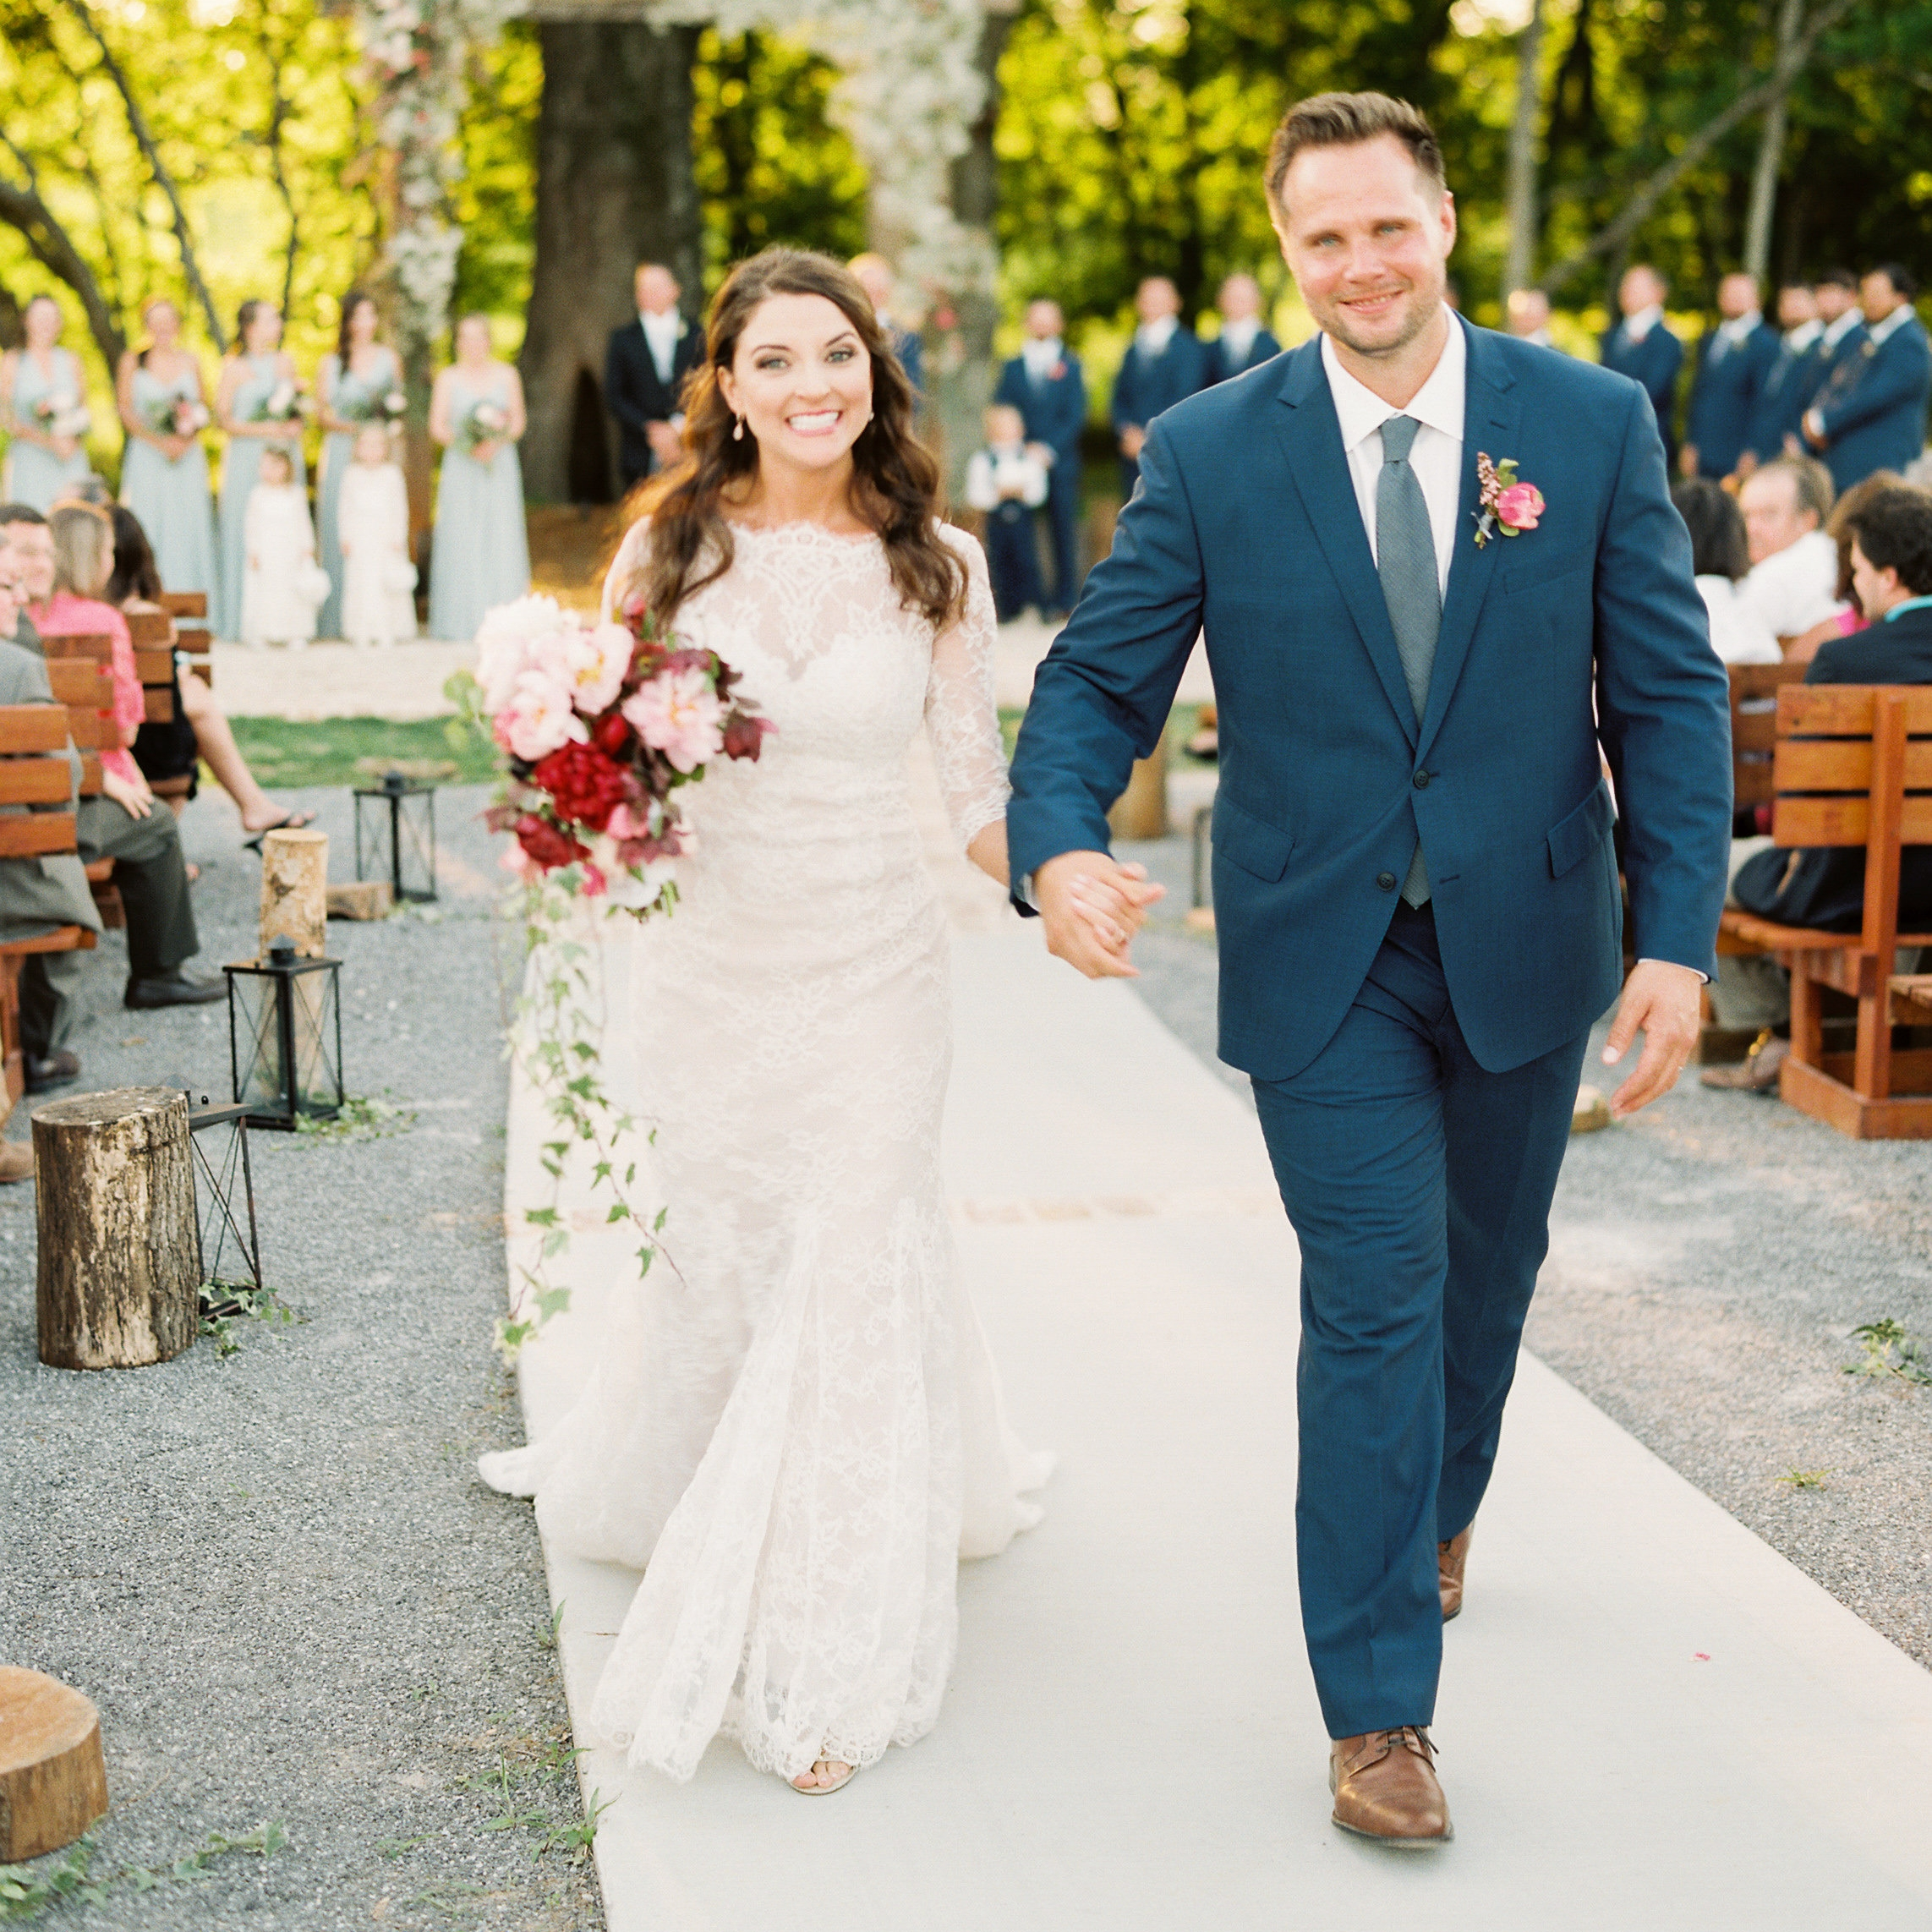 MRS. LINDSAY VALLAS OTT  Photographer | Rachel Solomon Dress | Custom Martina Liana Planner | Signature Occasions